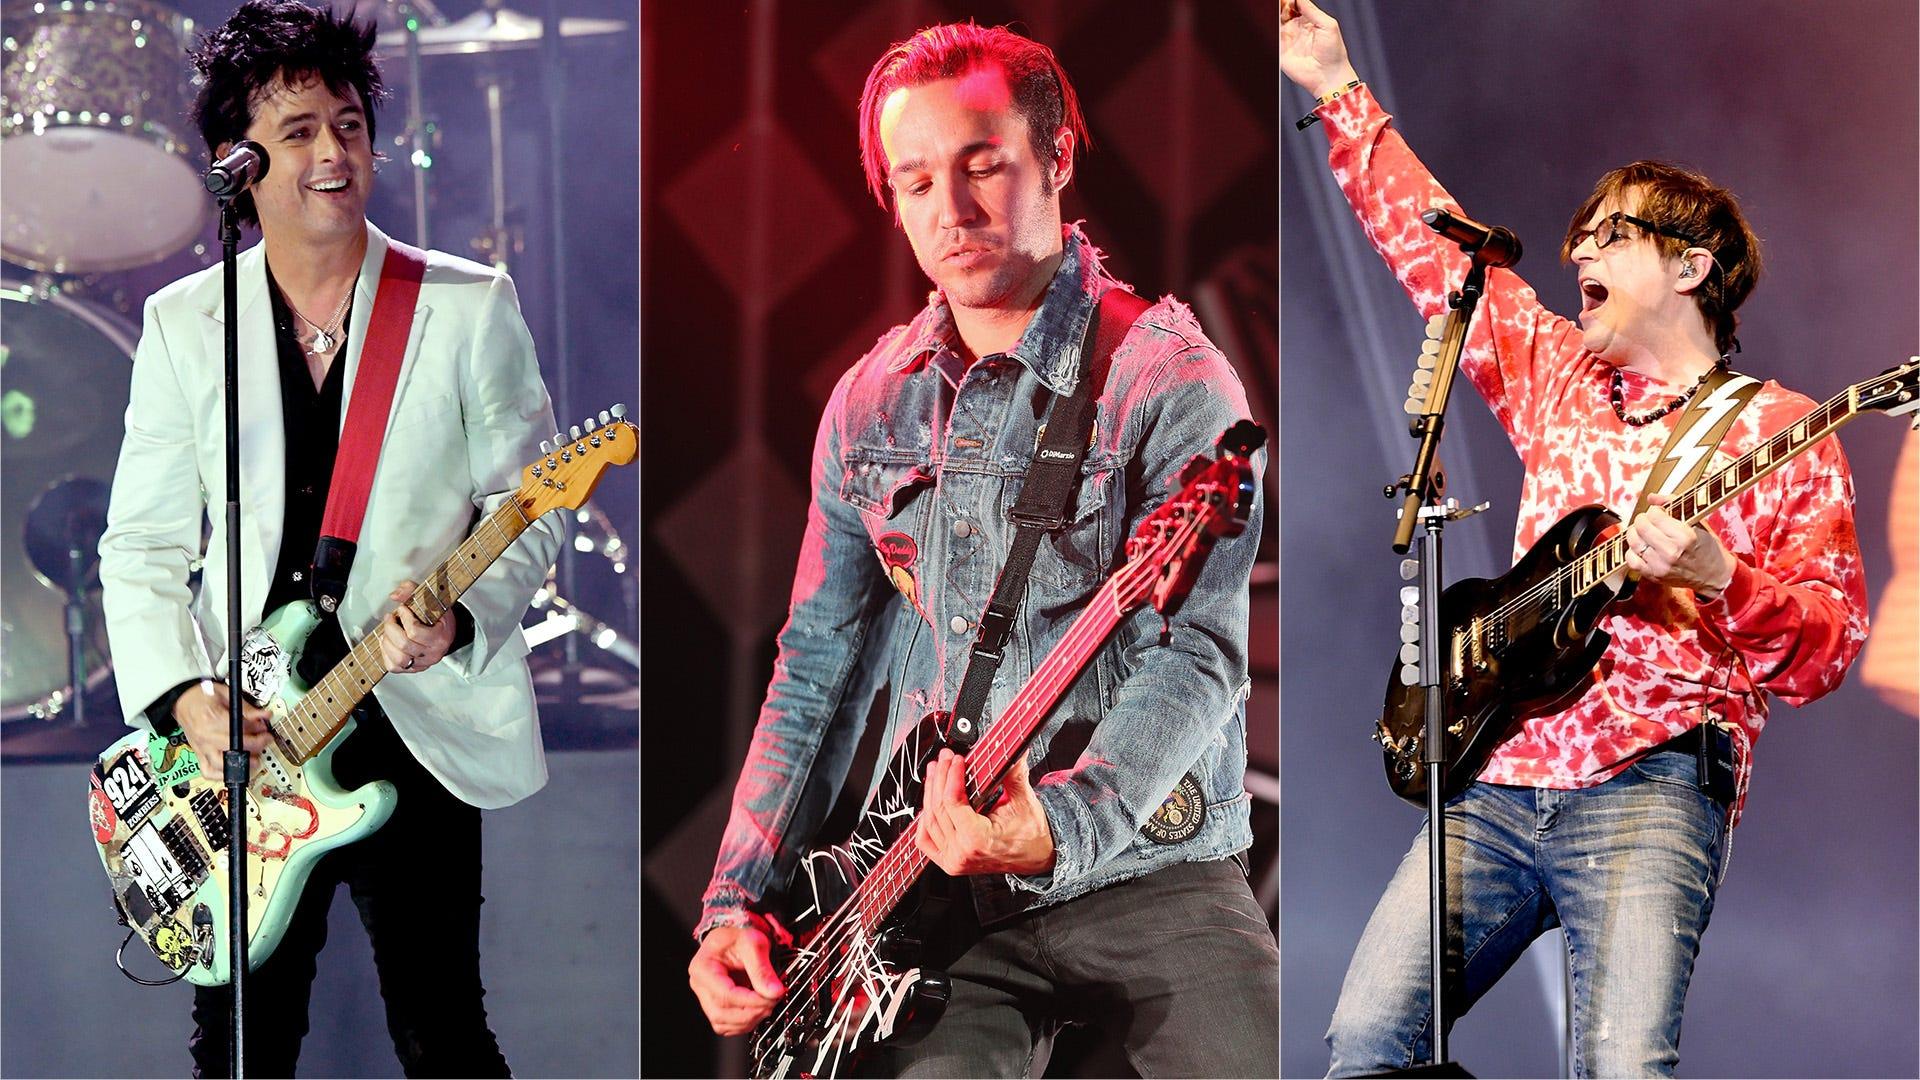 Green Day, Weezer, Fall Out Boy 'Hella Mega Tour' still on in US, despite postponement in Europe